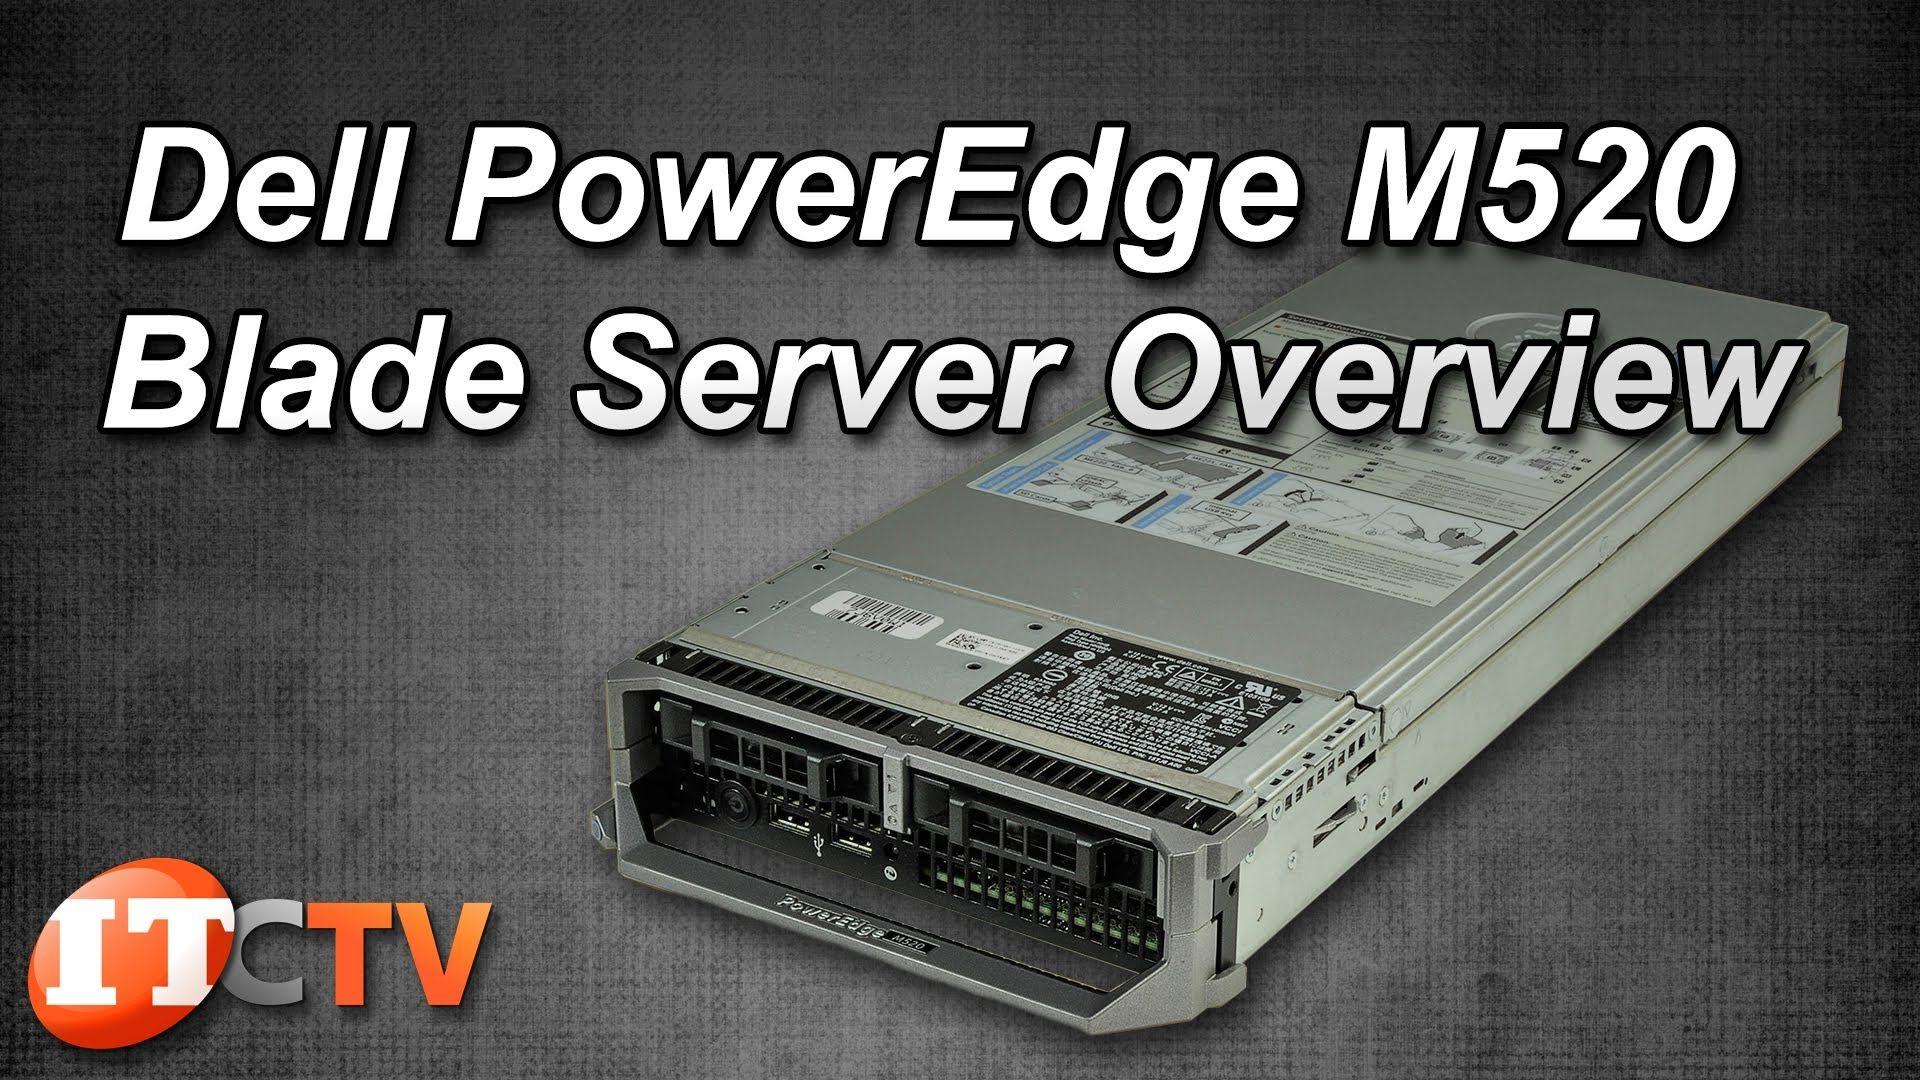 Dell PowerEdge M520 Blade Server Overview Dell's